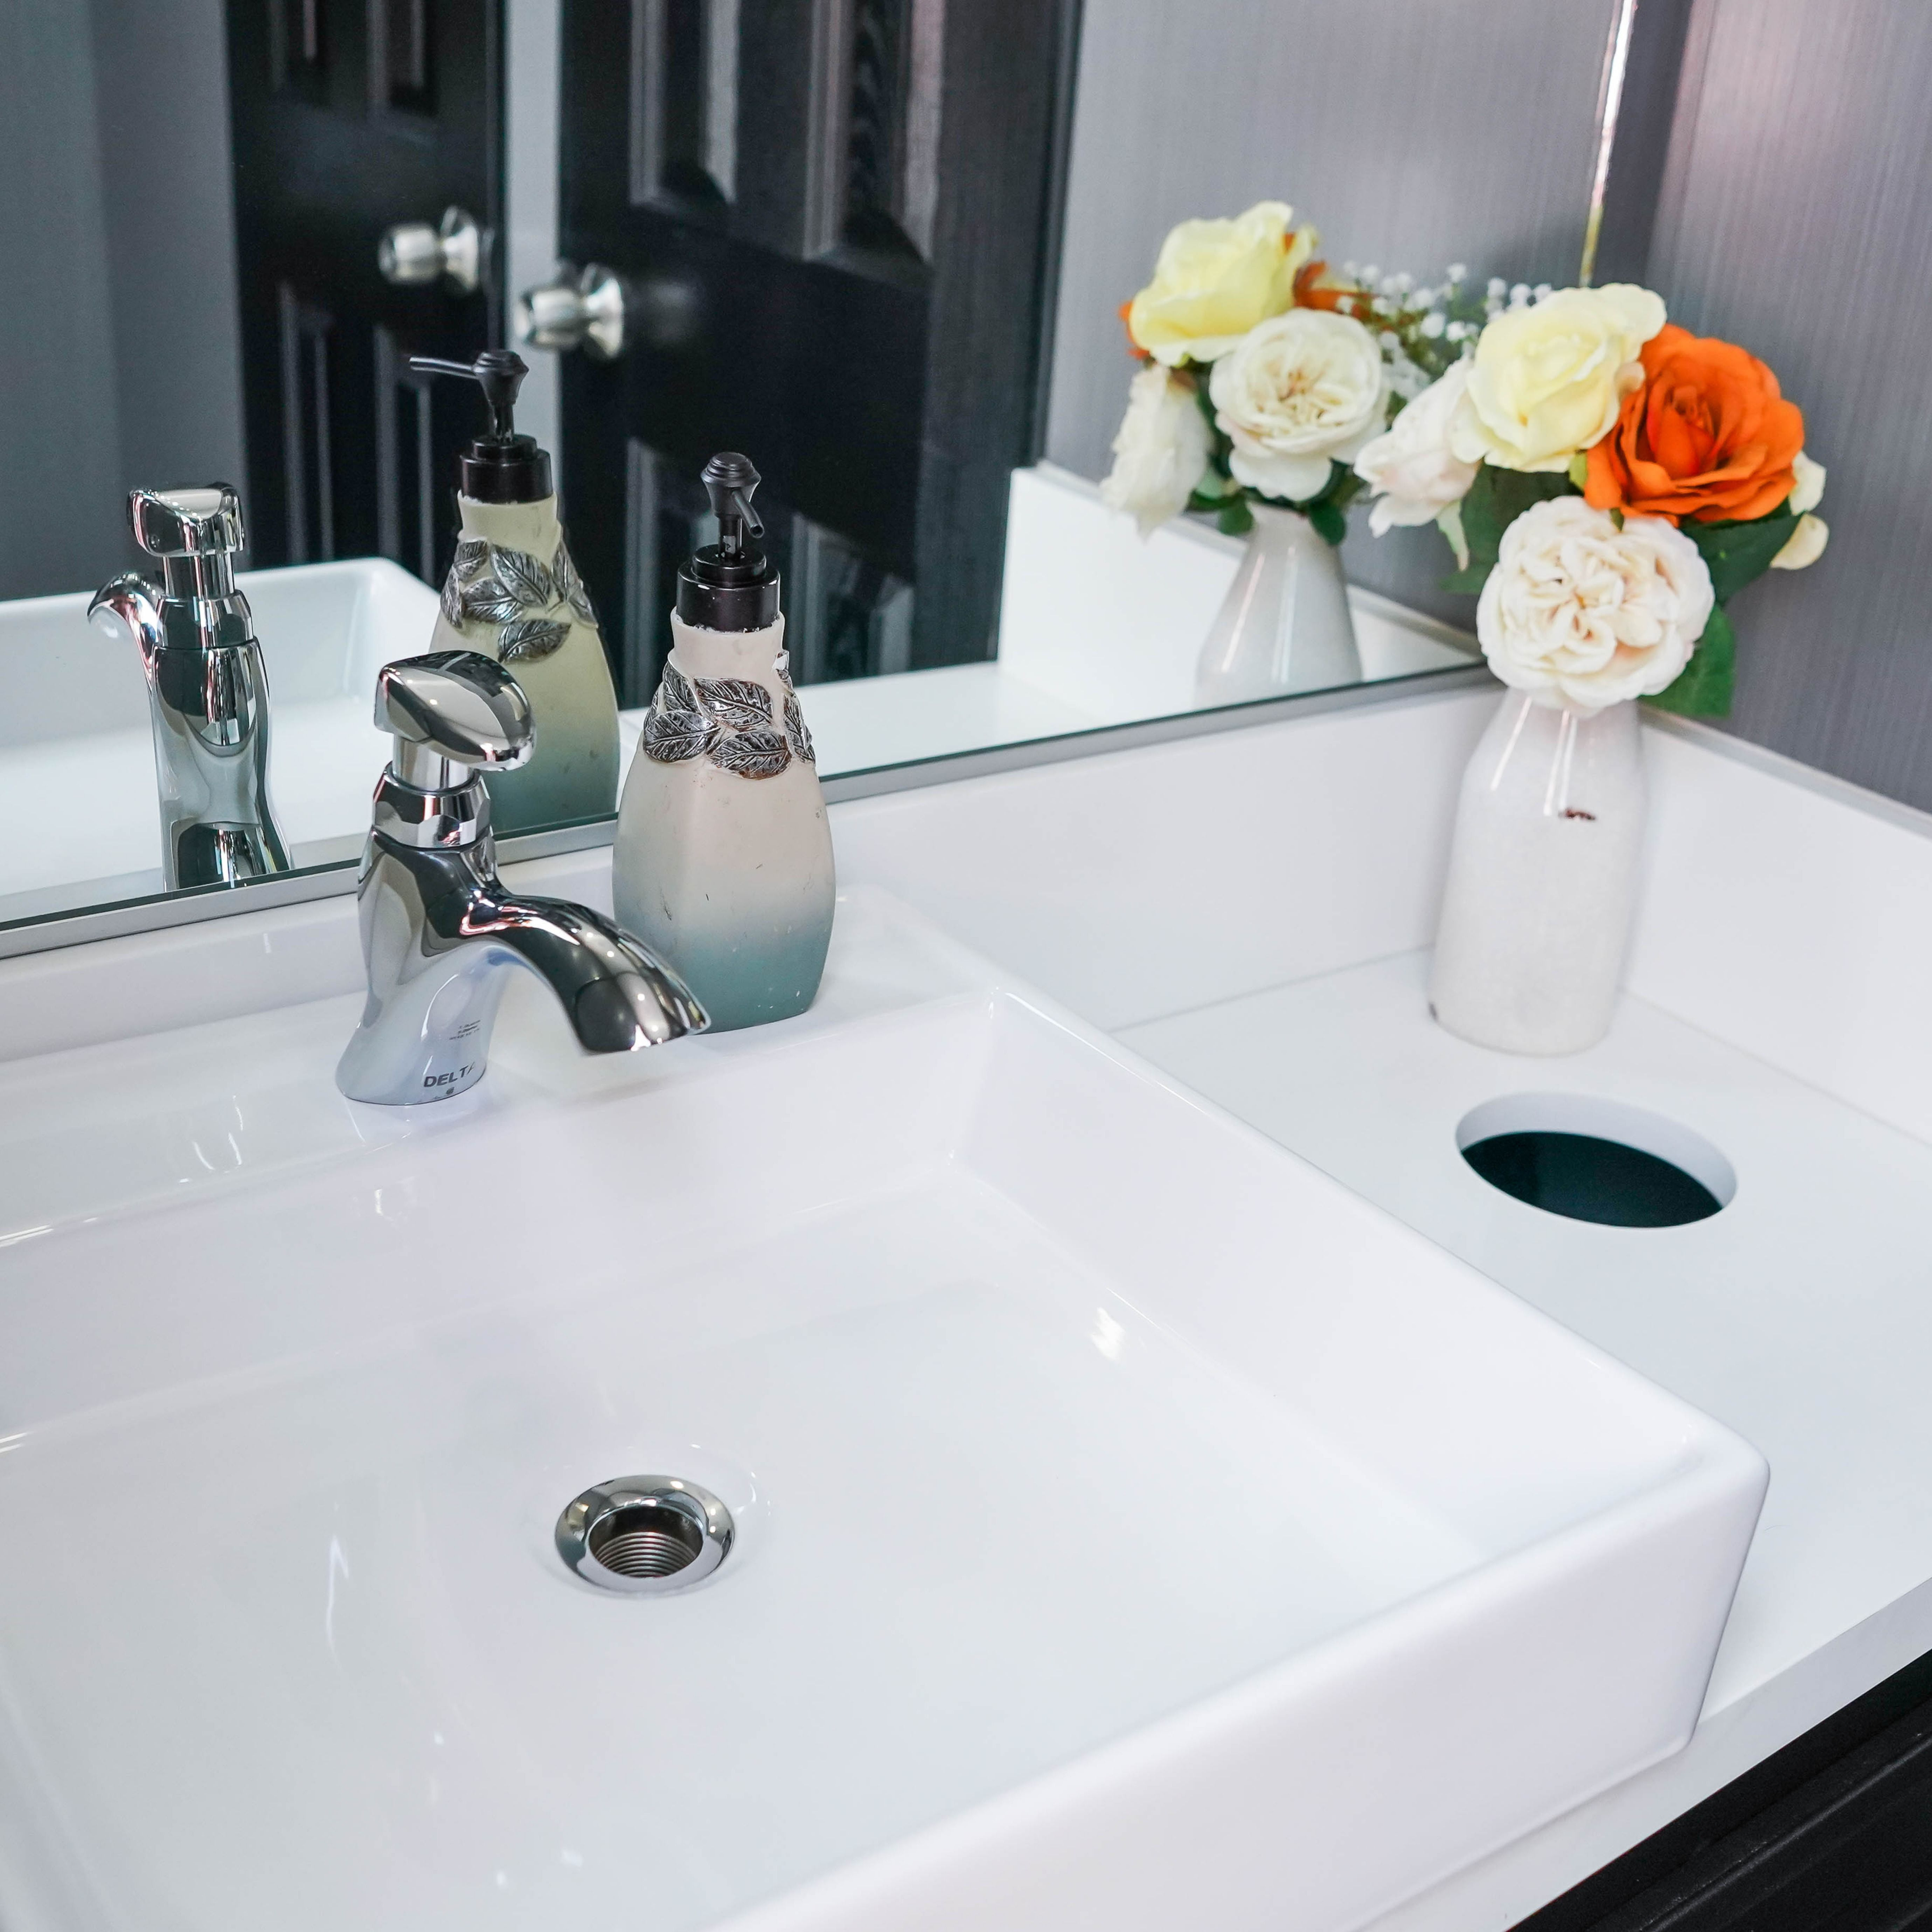 Luxury flush provides a variety of porta potty portable